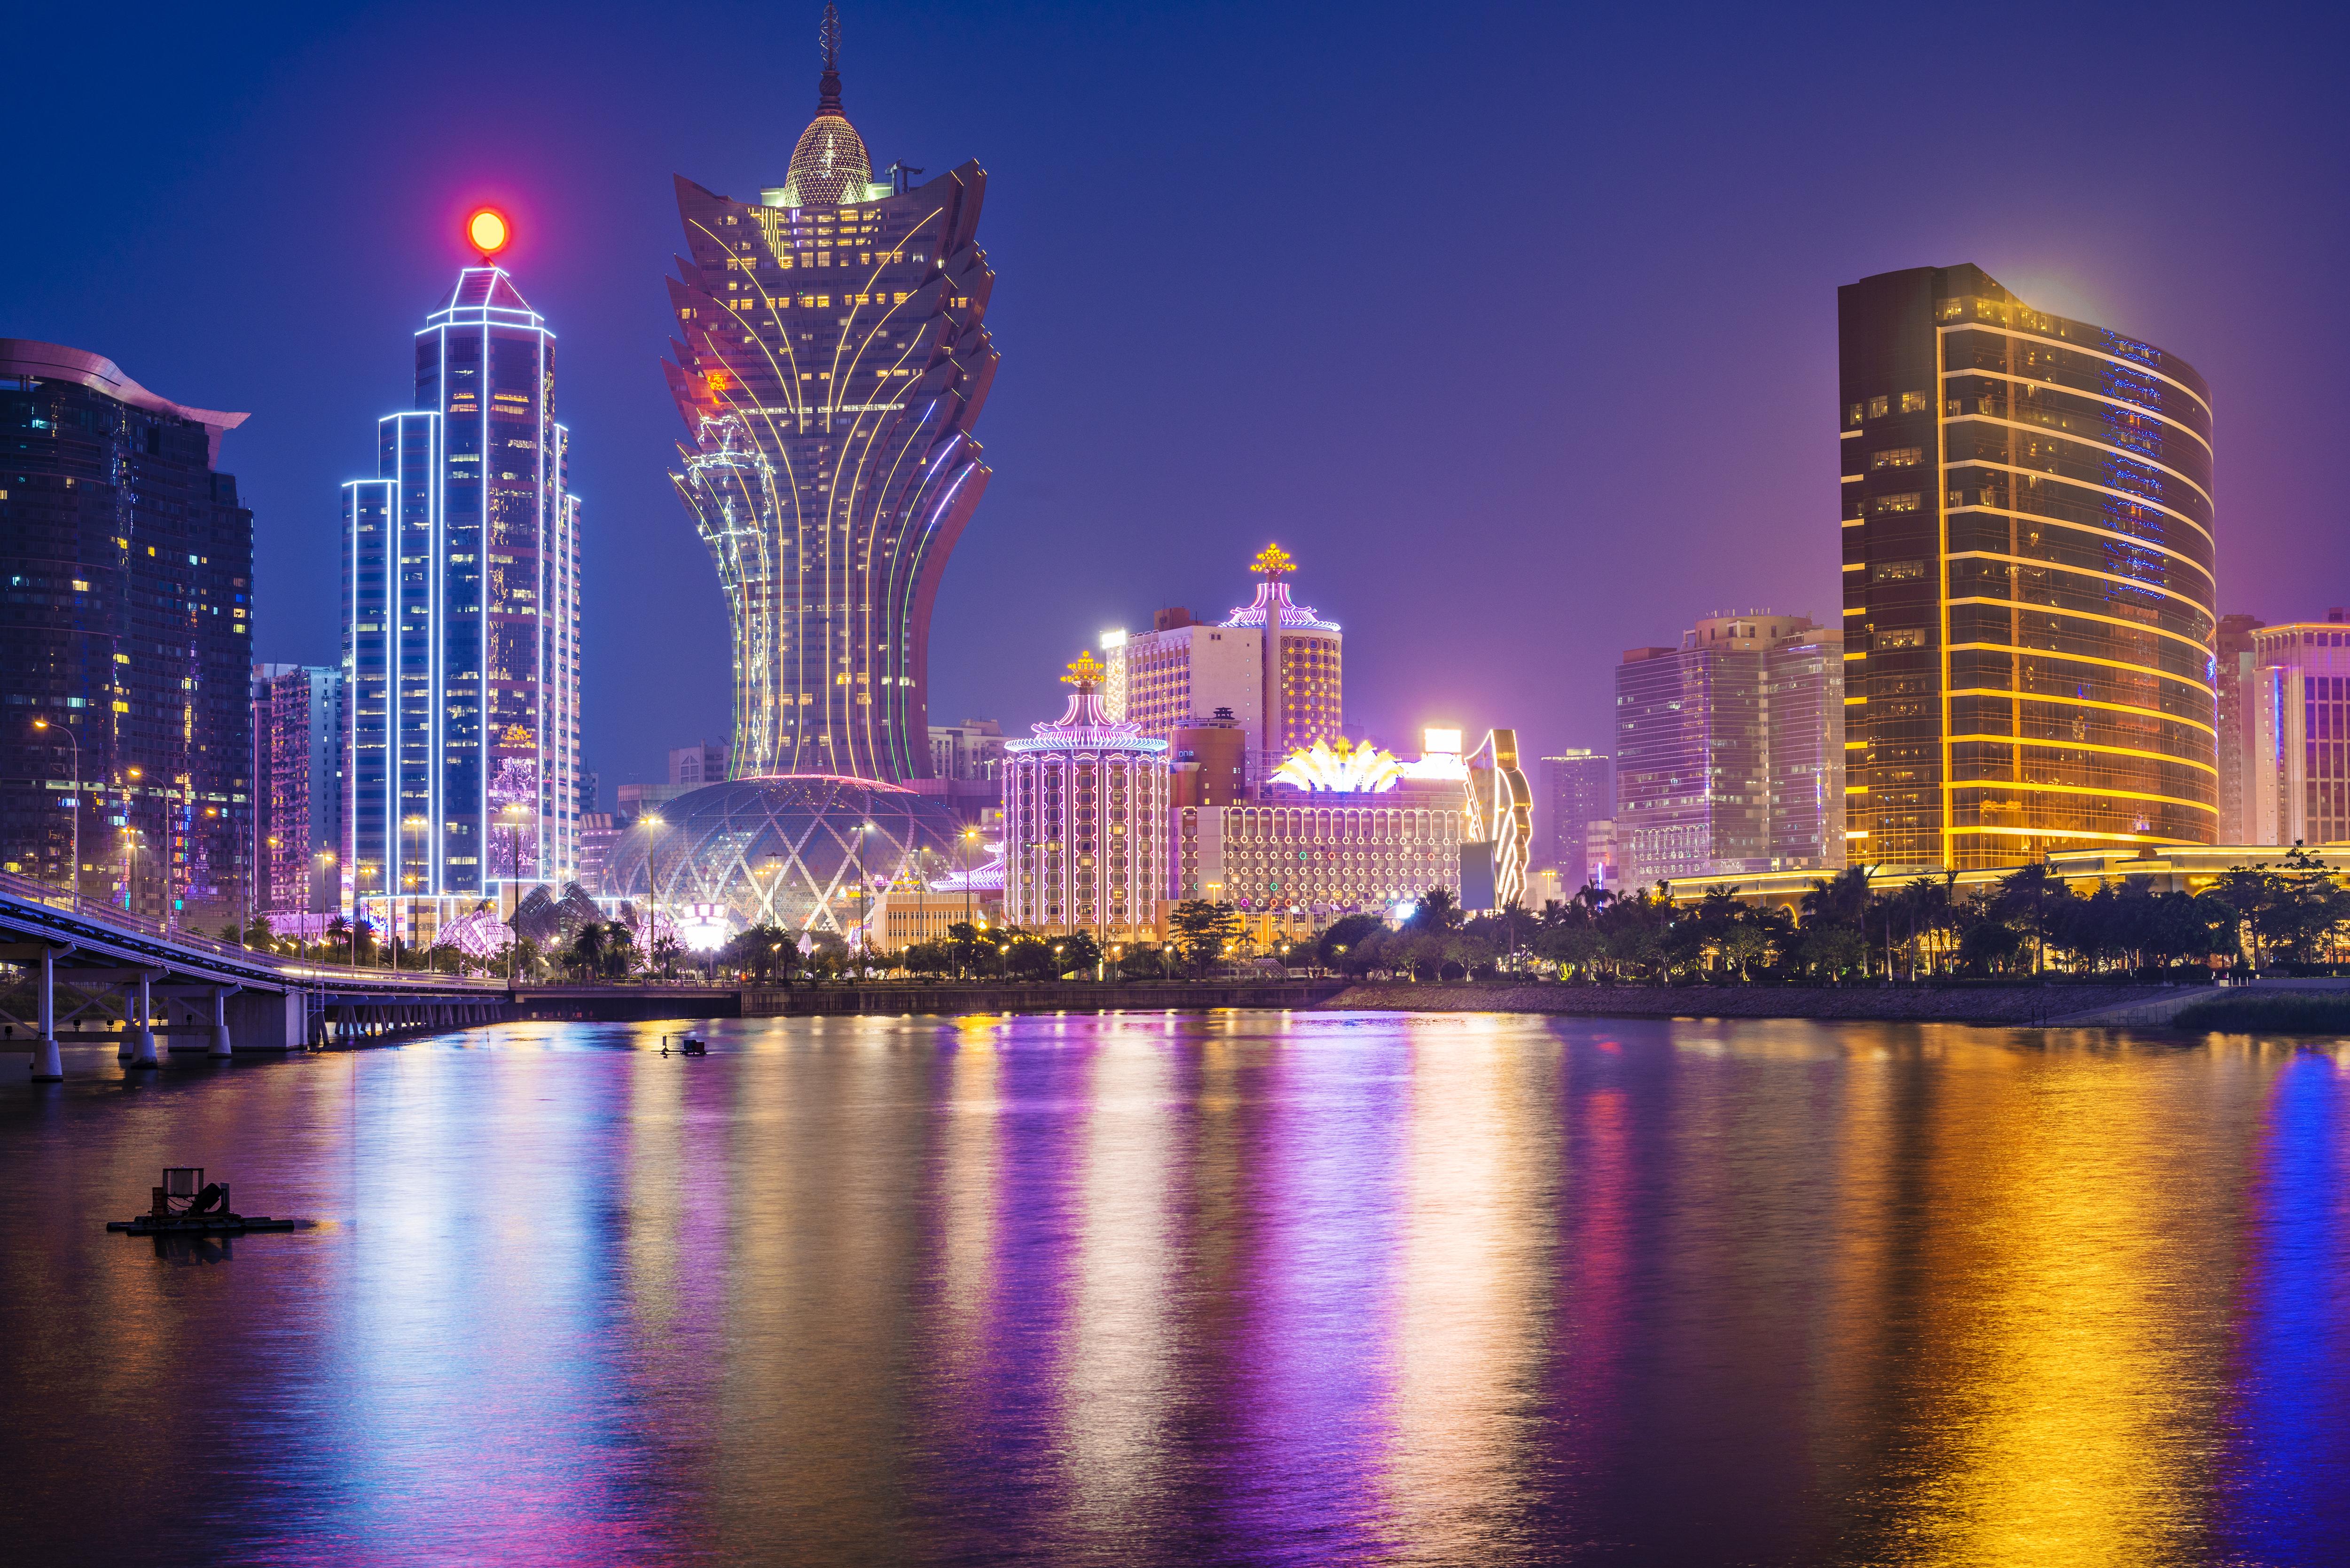 Macau's skyline from the water.